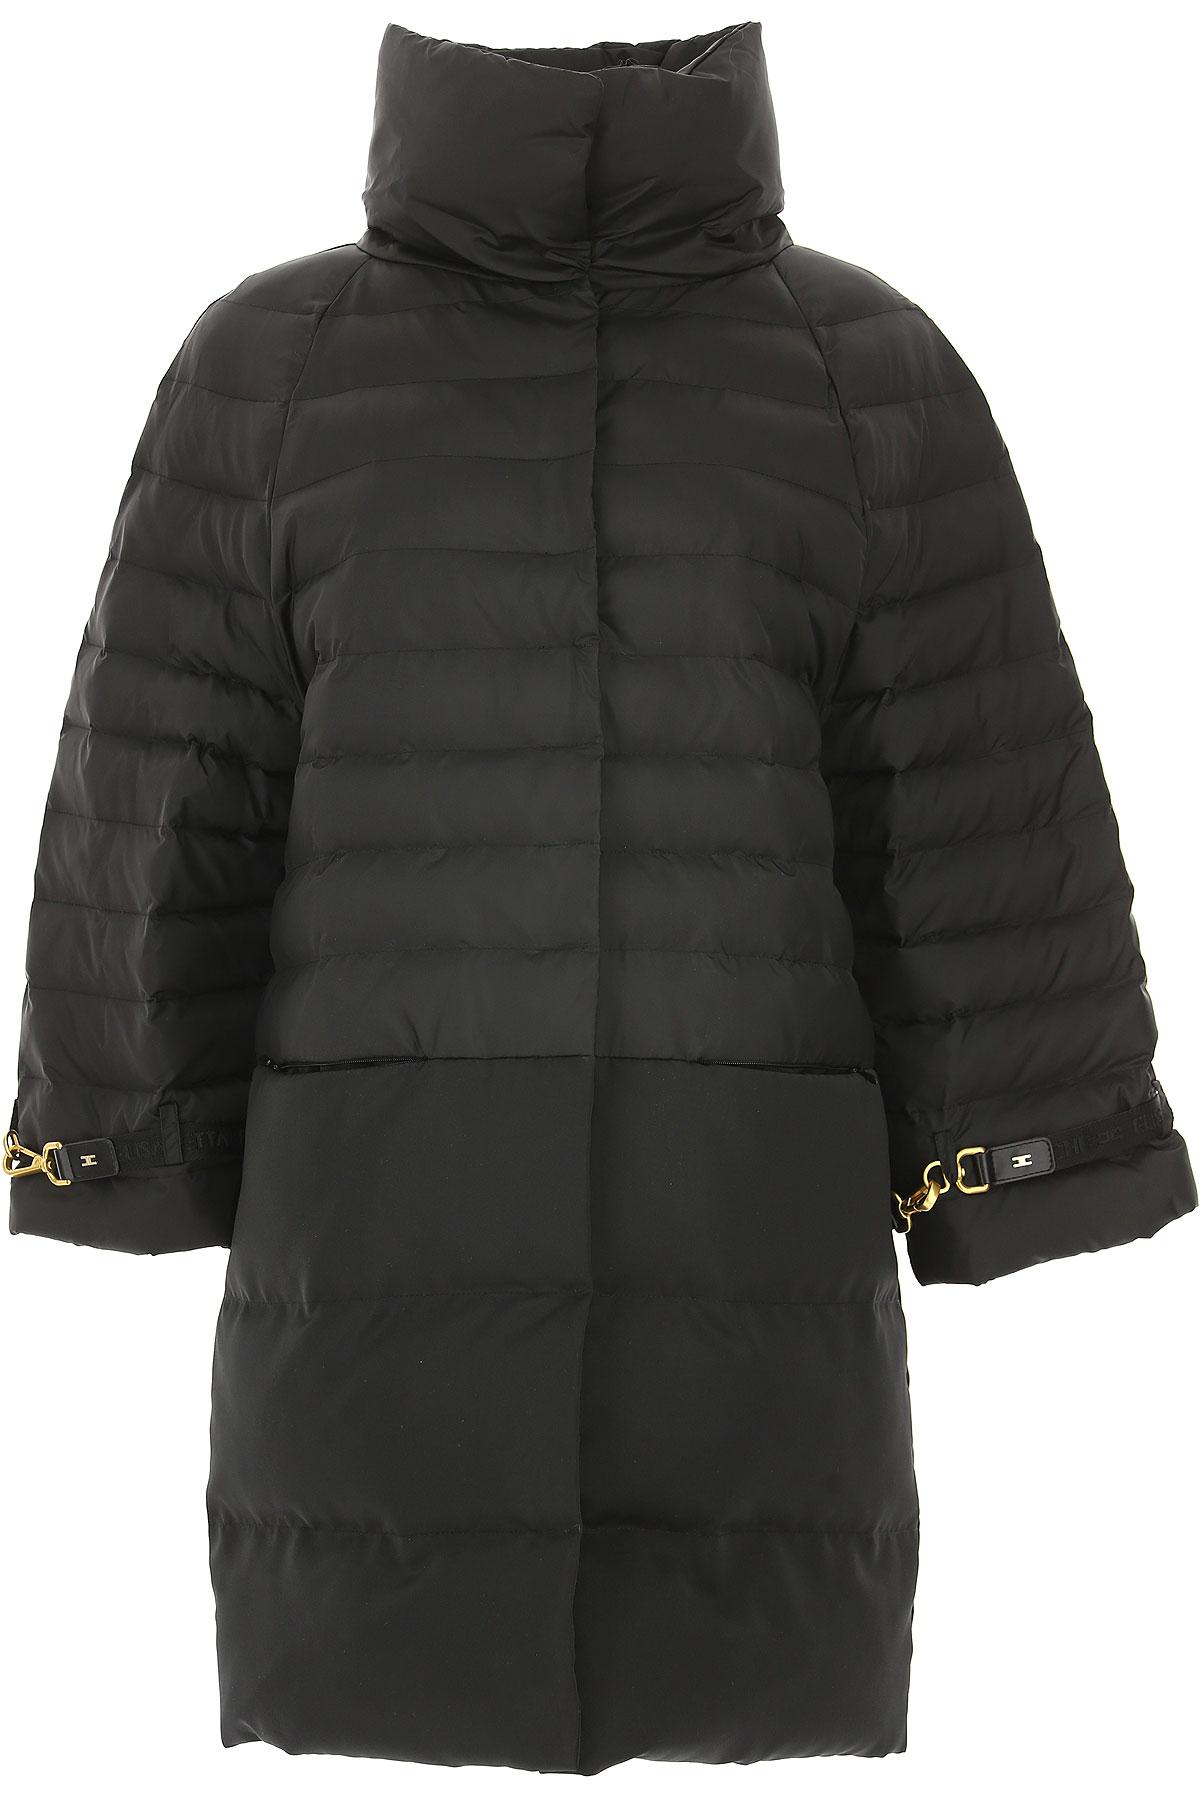 Image of Elisabetta Franchi Down Jacket for Women, Puffer Ski Jacket, Black, polyamide, 2017, 4 6